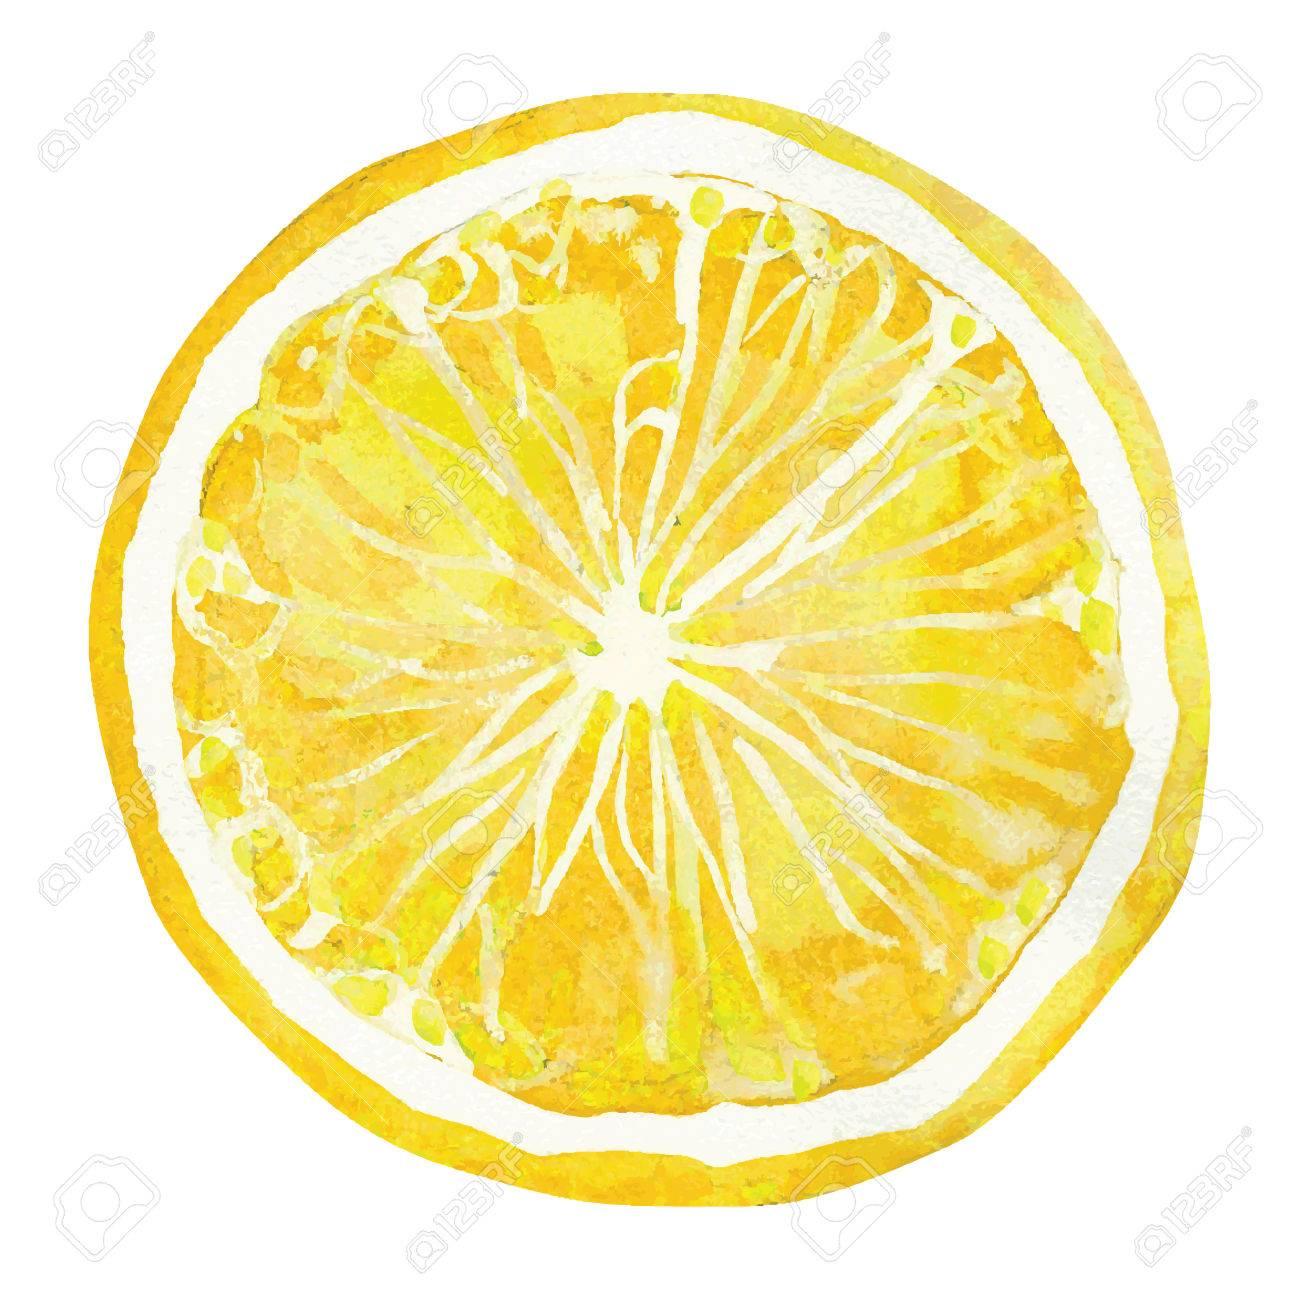 slice of lemon, watercolor vector illustration.